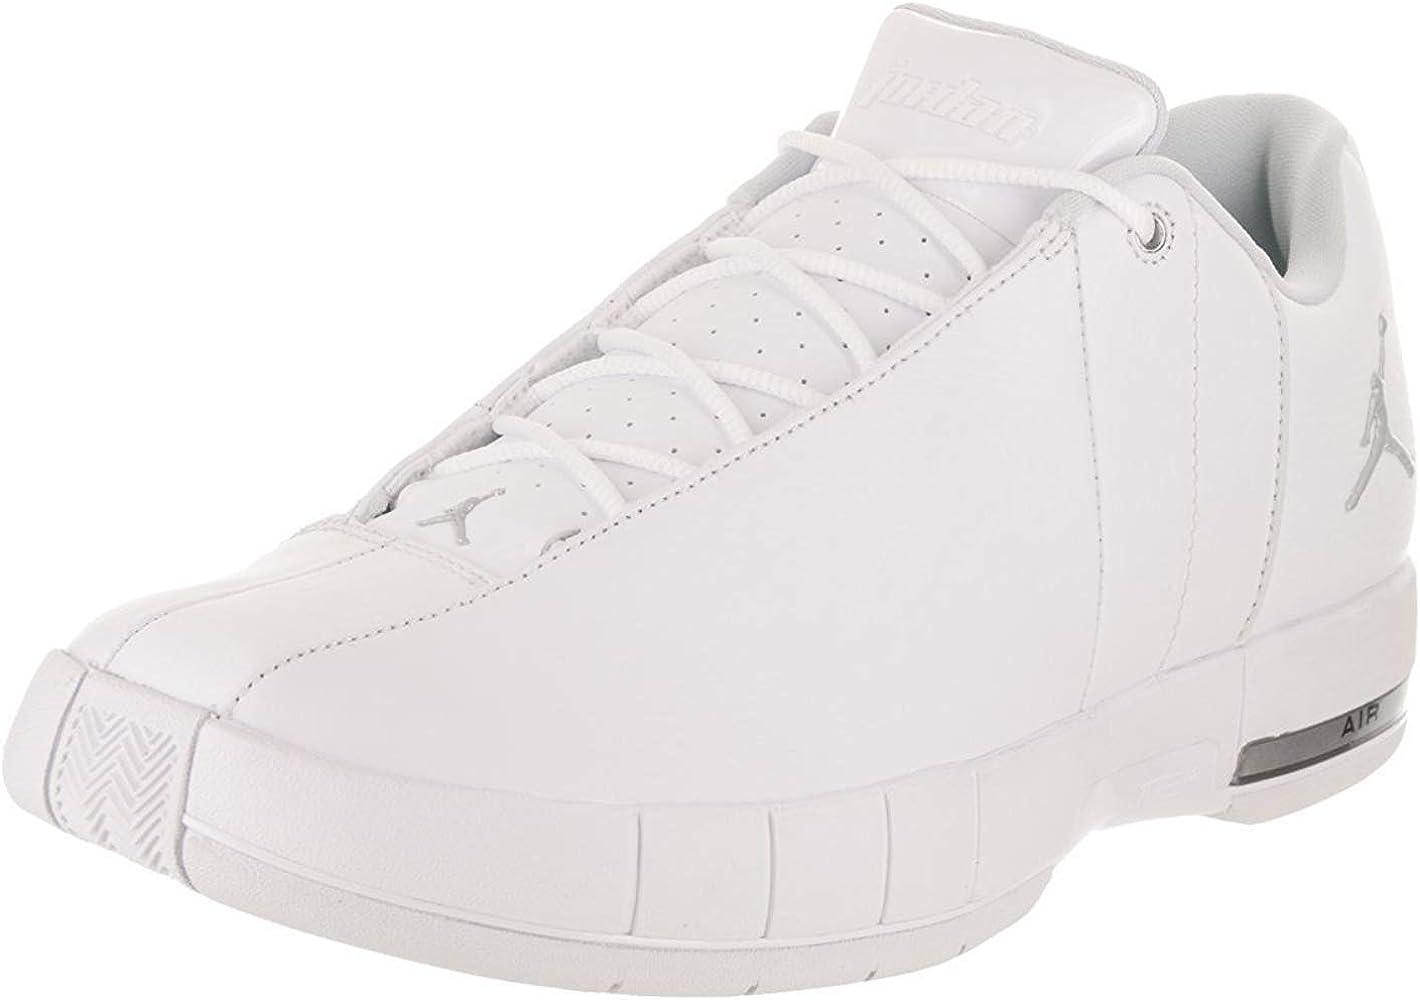 6ccca4e615811 AO1696-100: Team Elite 2 Low Men's White/Metalic Silver Sneakers (7.5 D(M)  US)